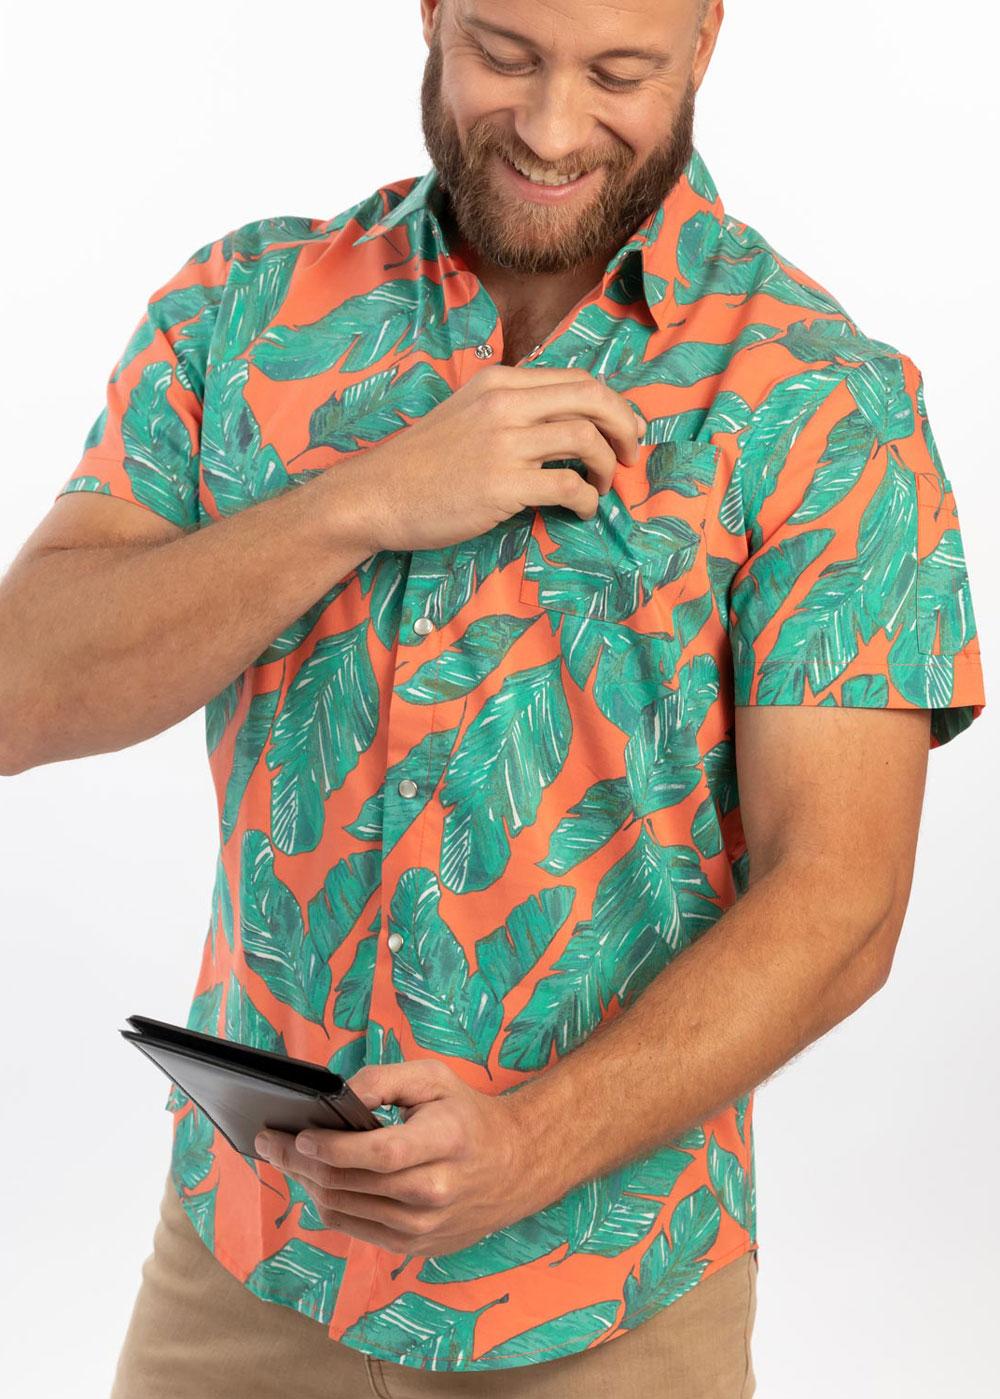 Unisex Slim Short Sleeve Stretch Print Work Shirt (CW4350) - Paradise Palm Coral